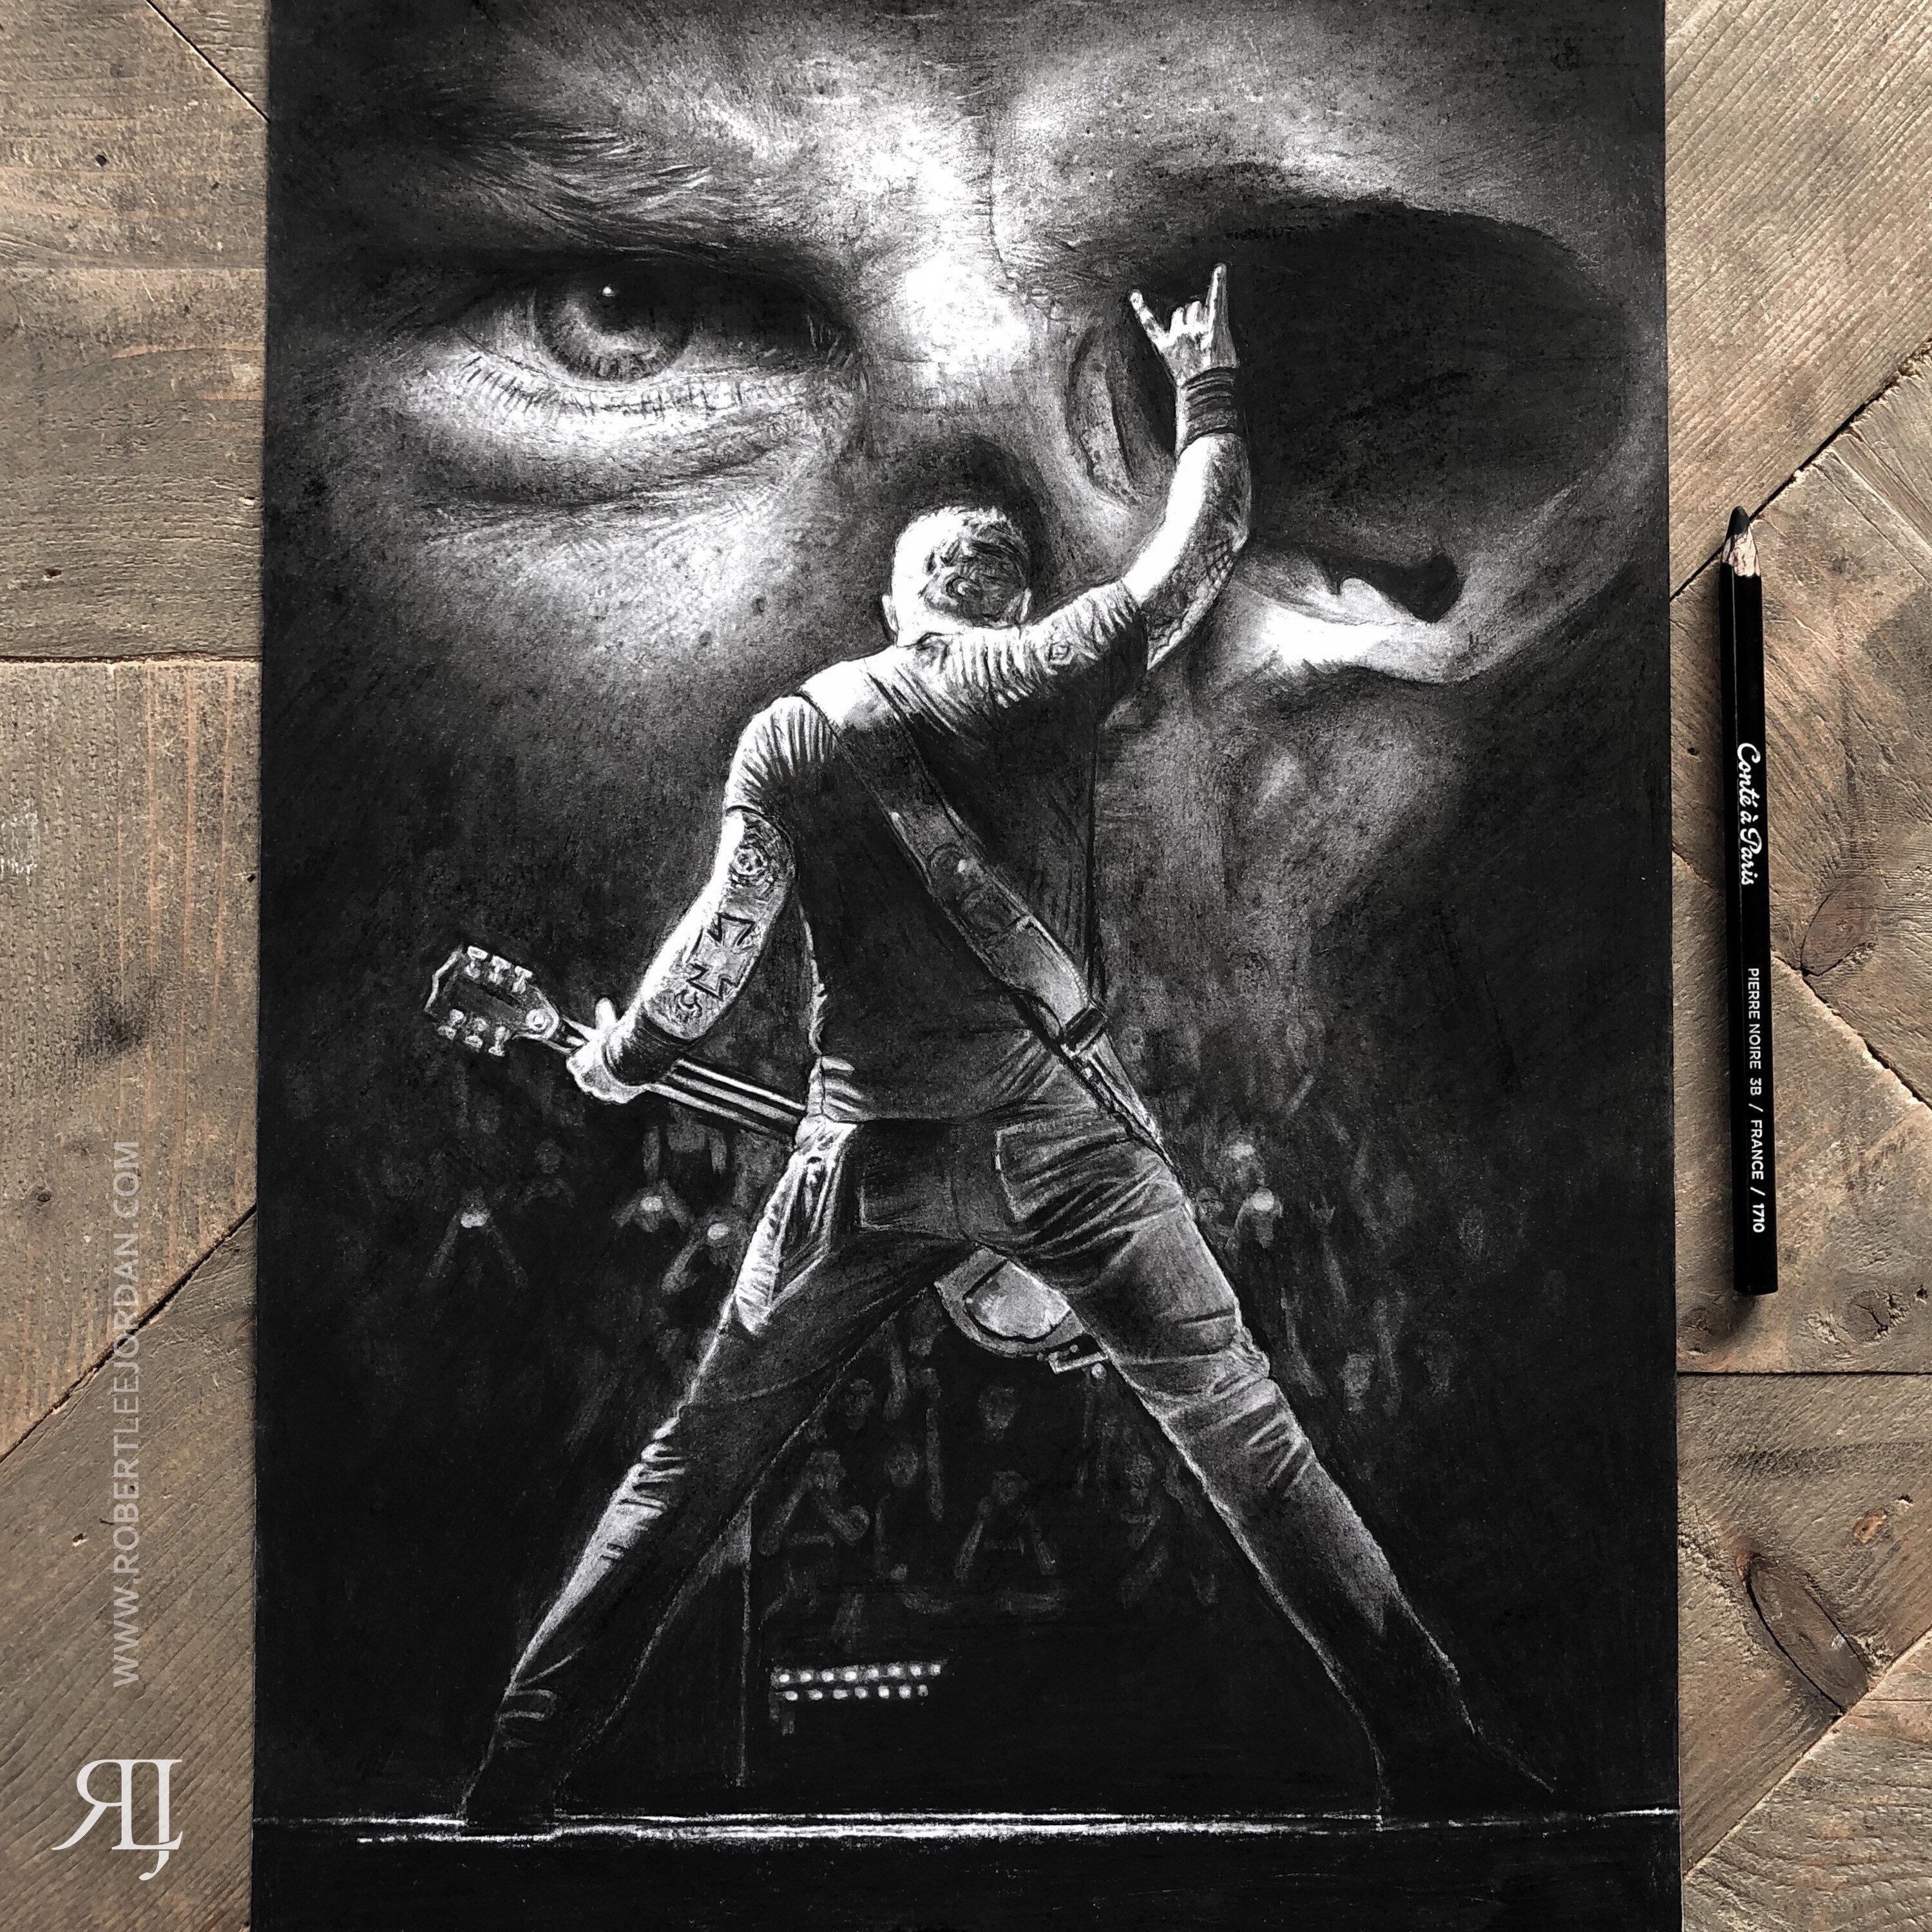 Original metallica james hetfield portrait din a3 realistic pencil drawing art drawing metallica wall art papa het christmas gift